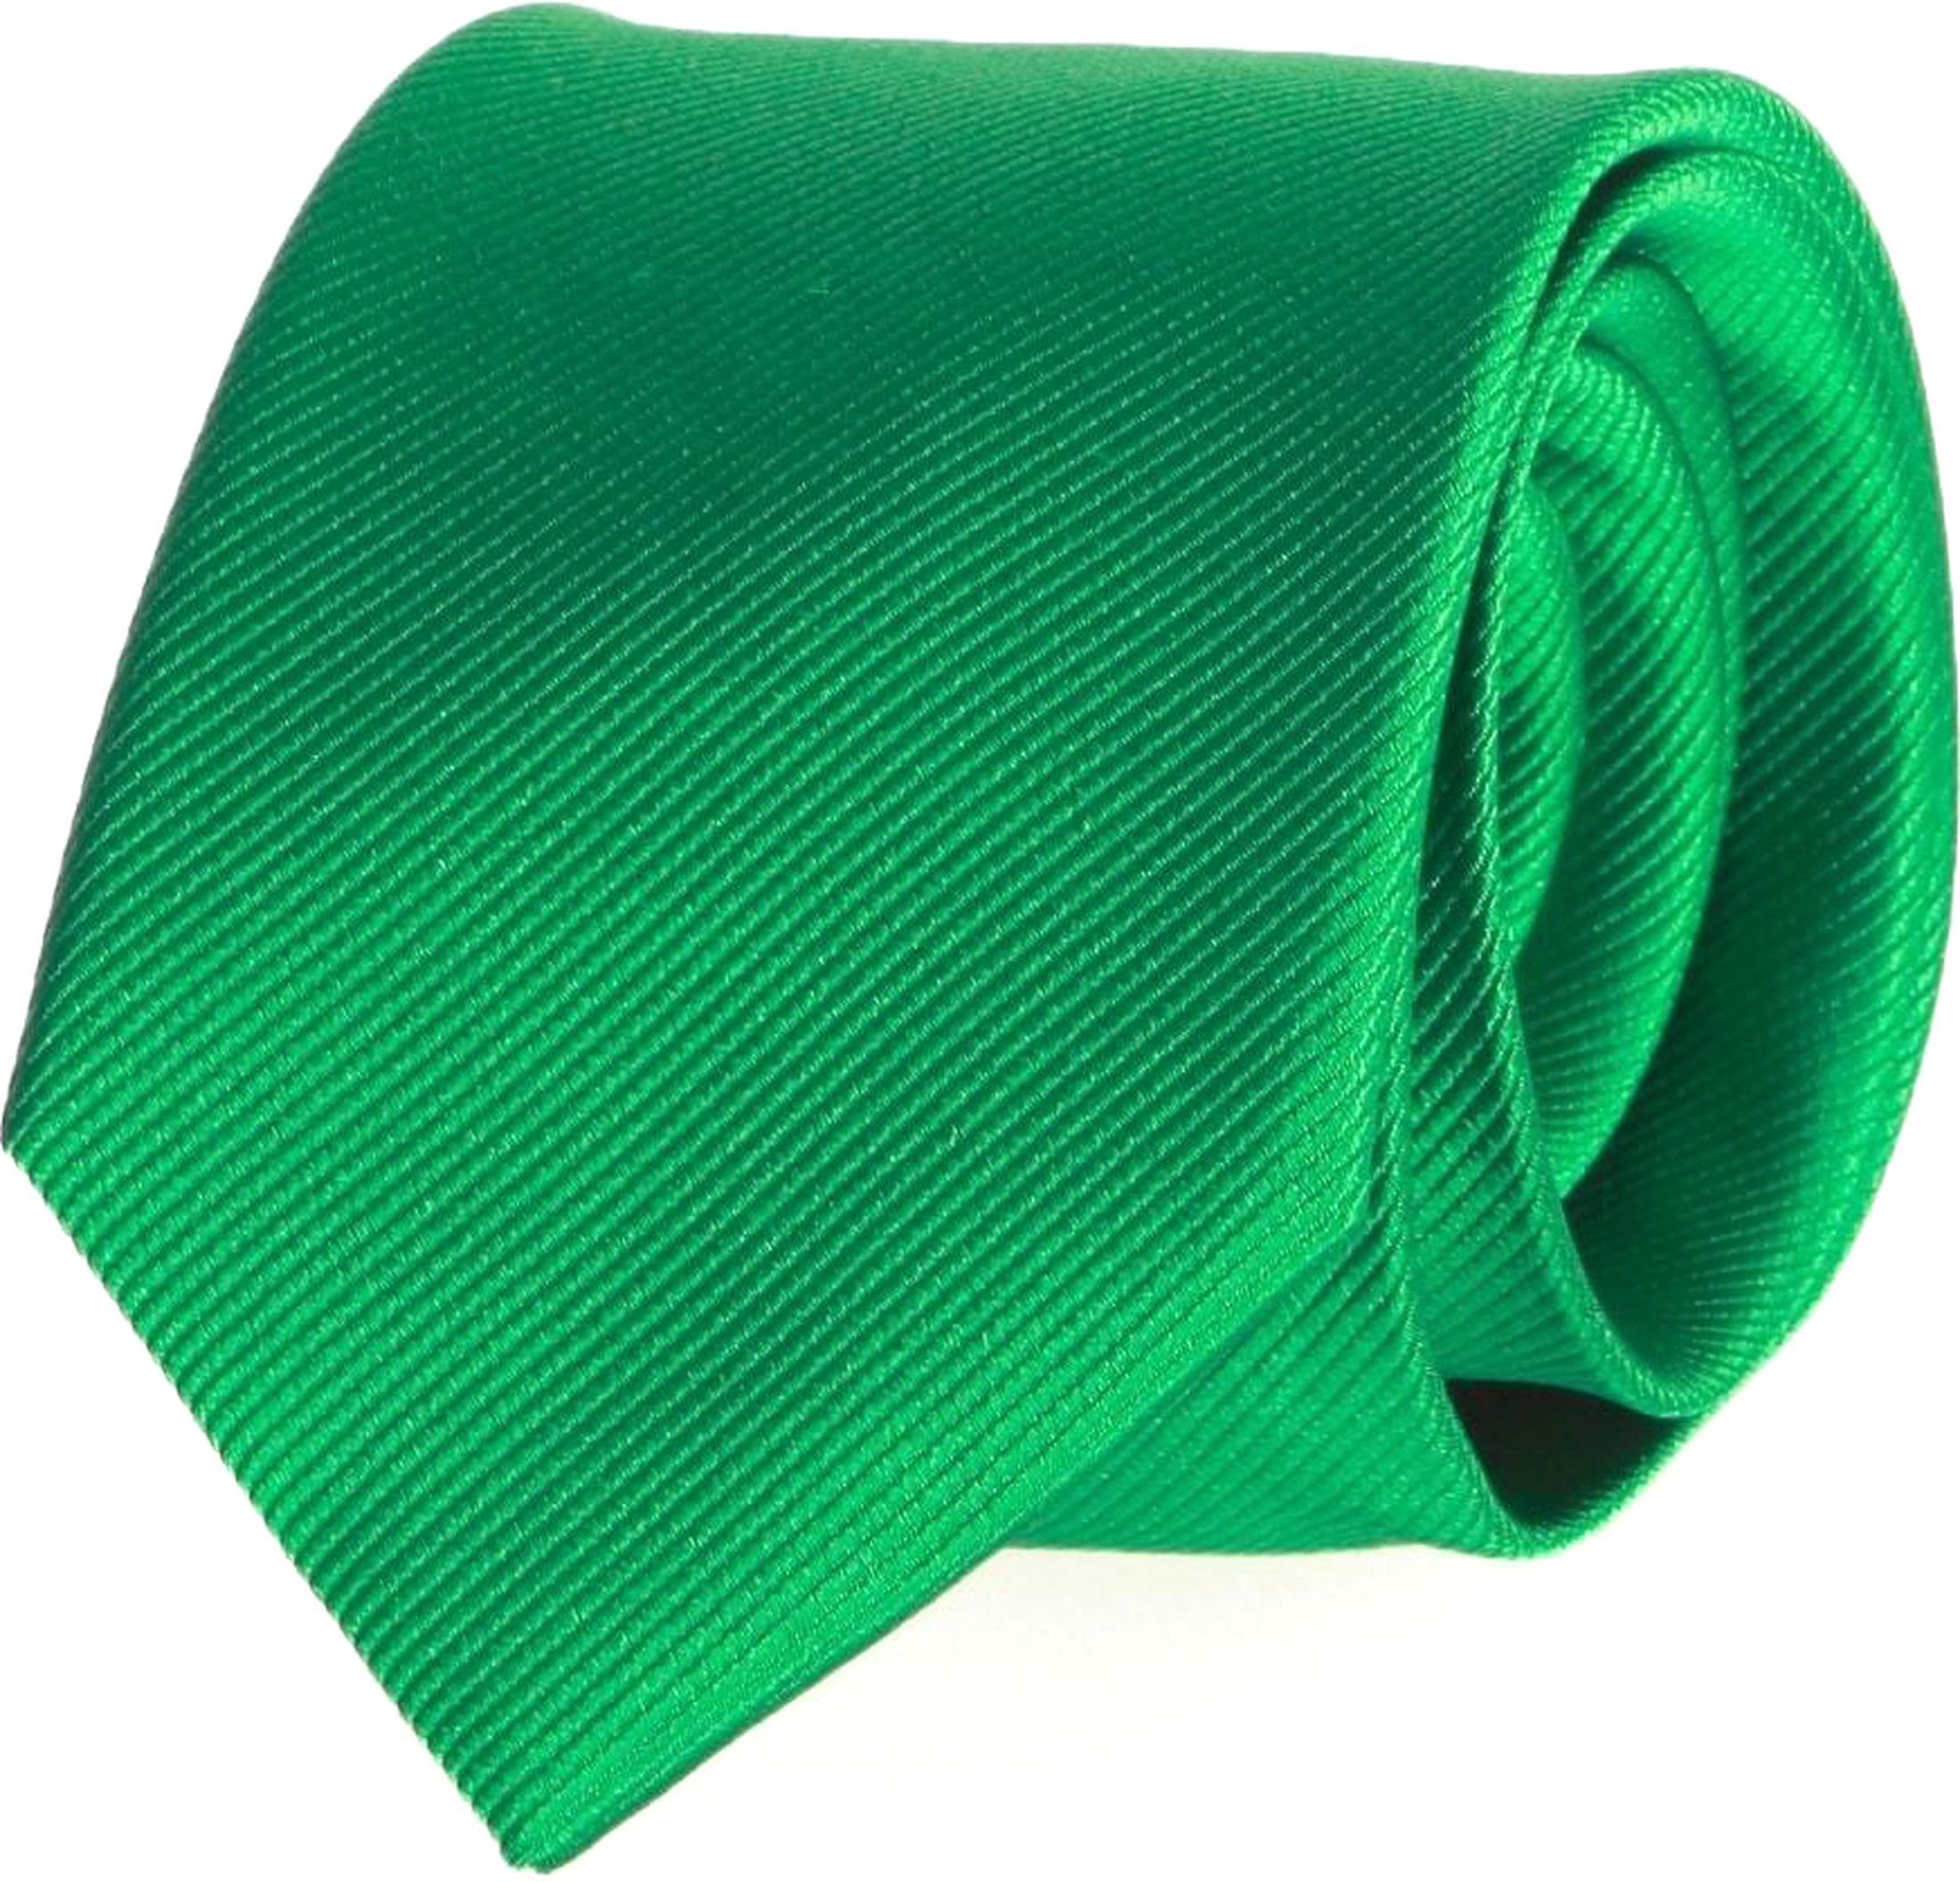 Krawatte Seide Smaragdgrün Uni F68 foto 0